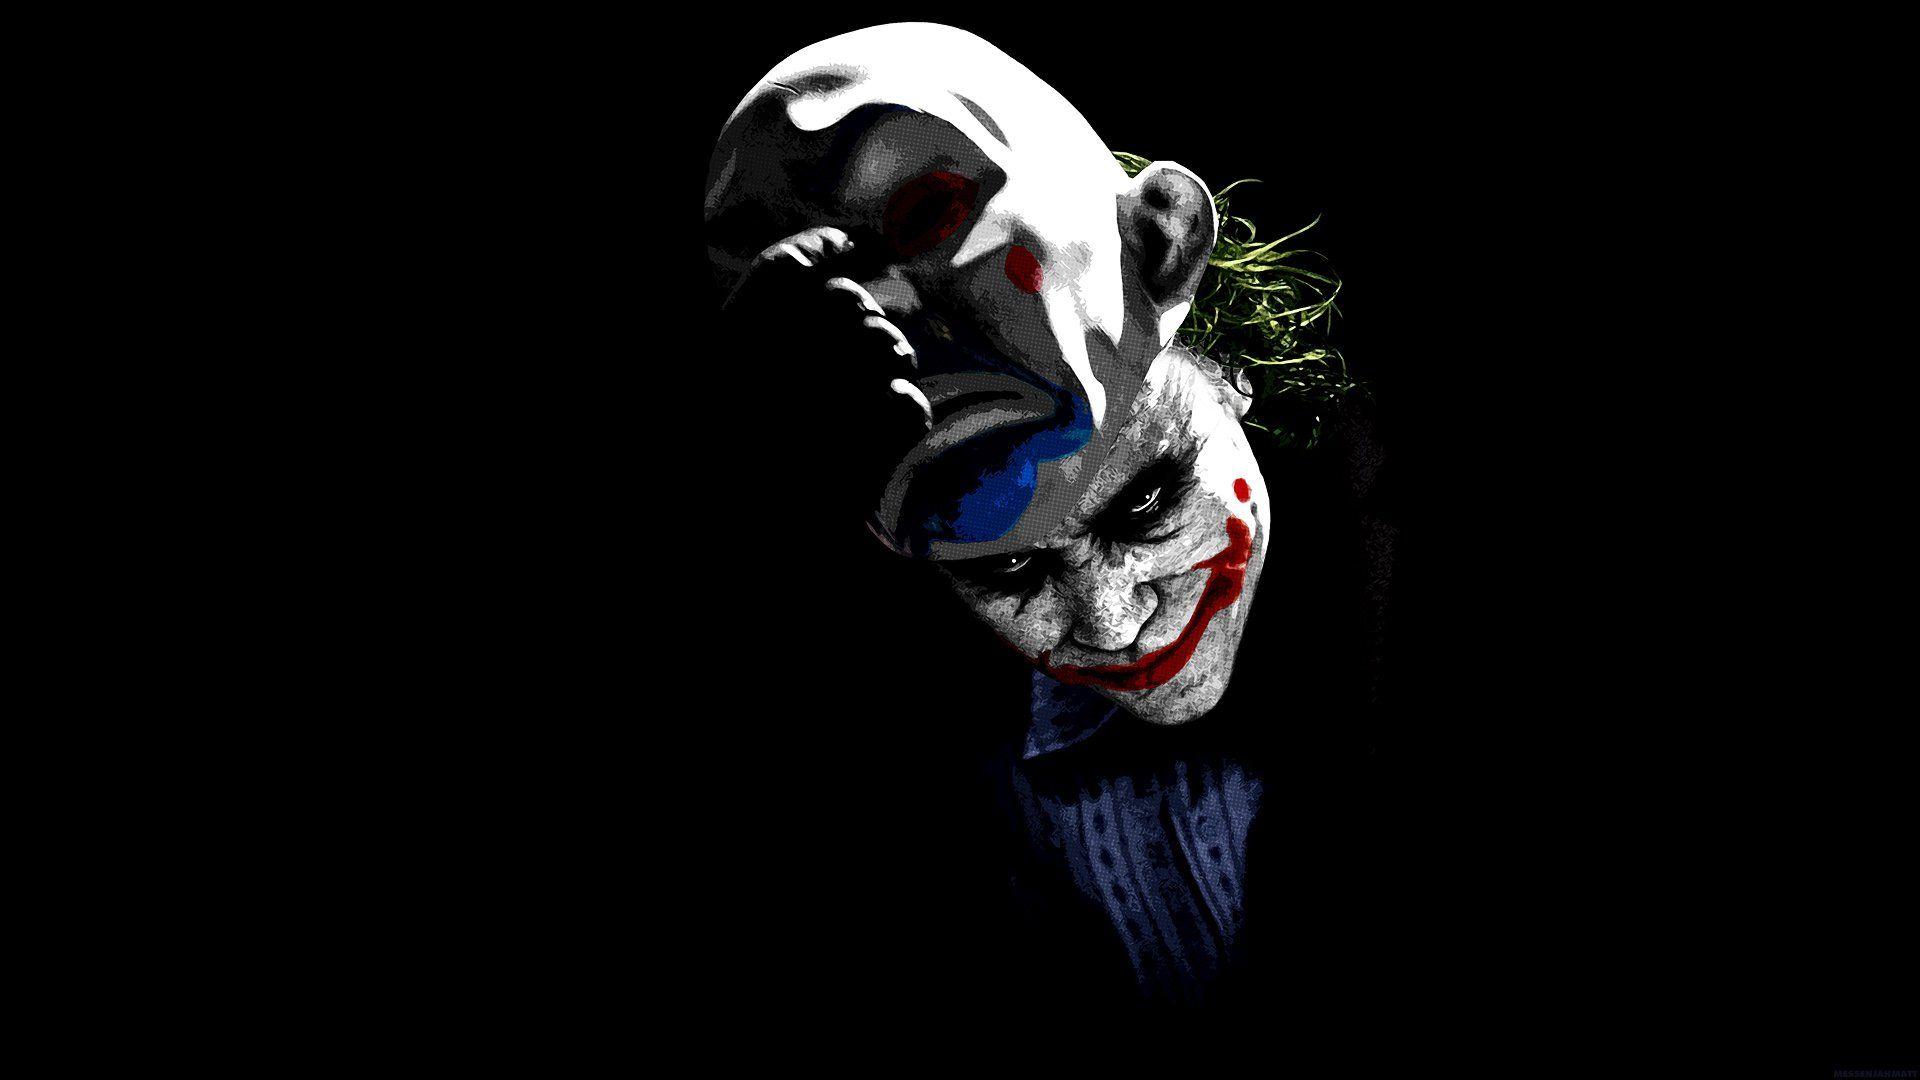 47 Joker Hd Wallpapers 1080p On Wallpapersafari Pc Desktop Wallpaper Joker Iphone Wallpaper Joker Wallpapers